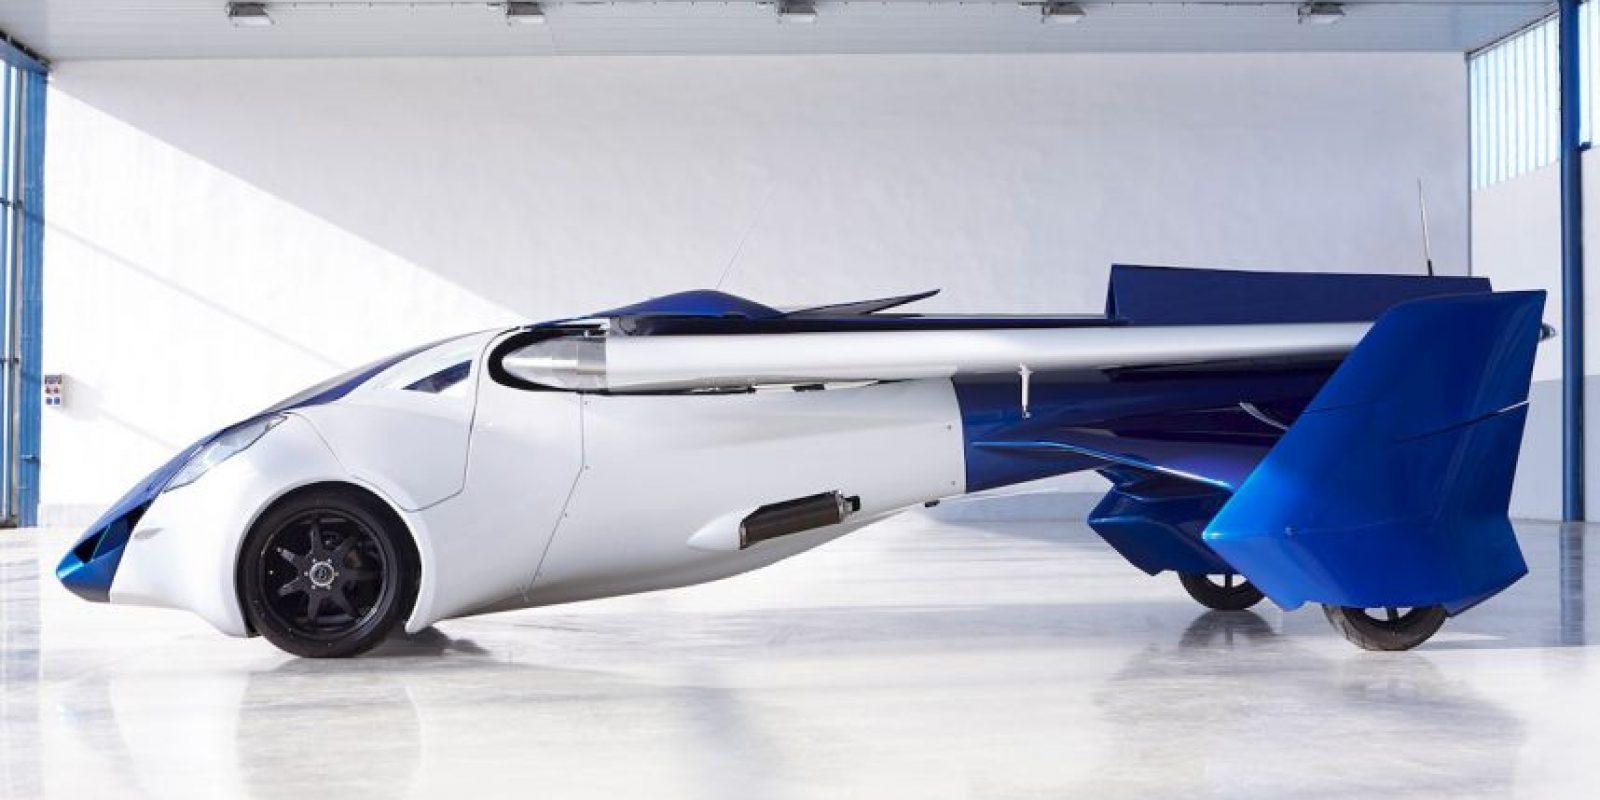 Foto:Vía www.aeromobil.com